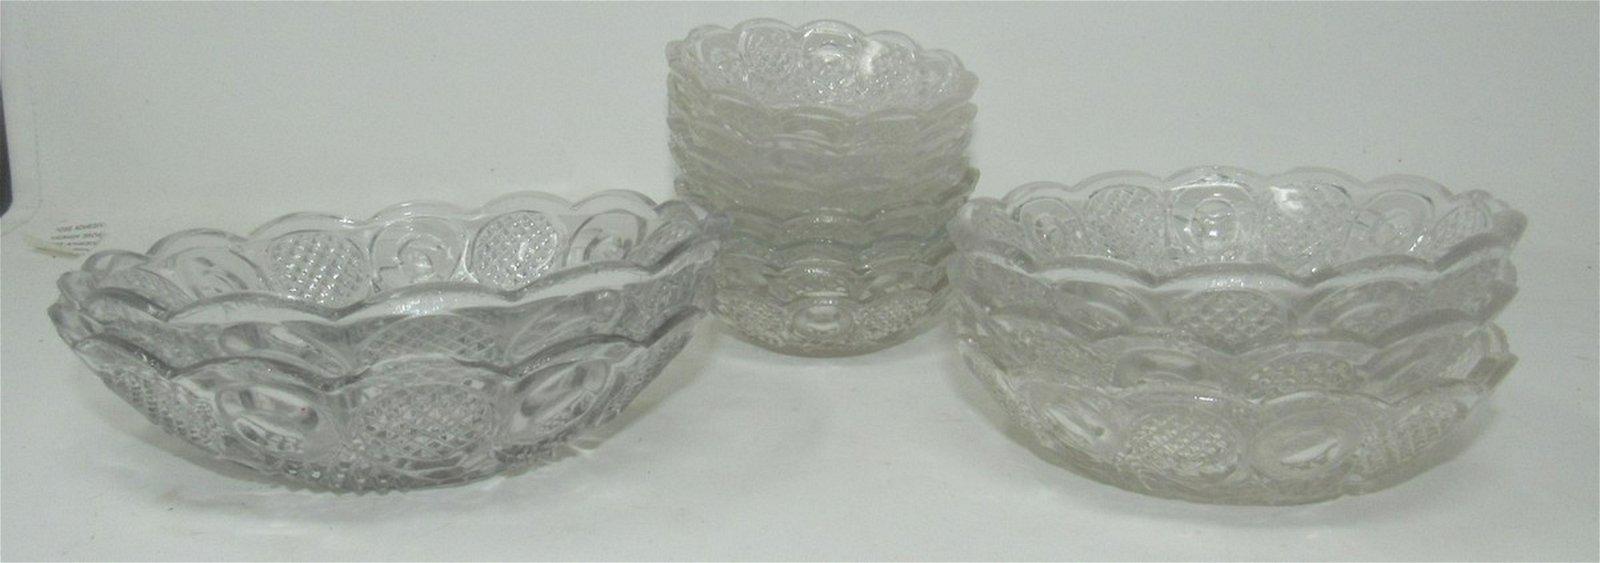 Sandwich Glass Dishes